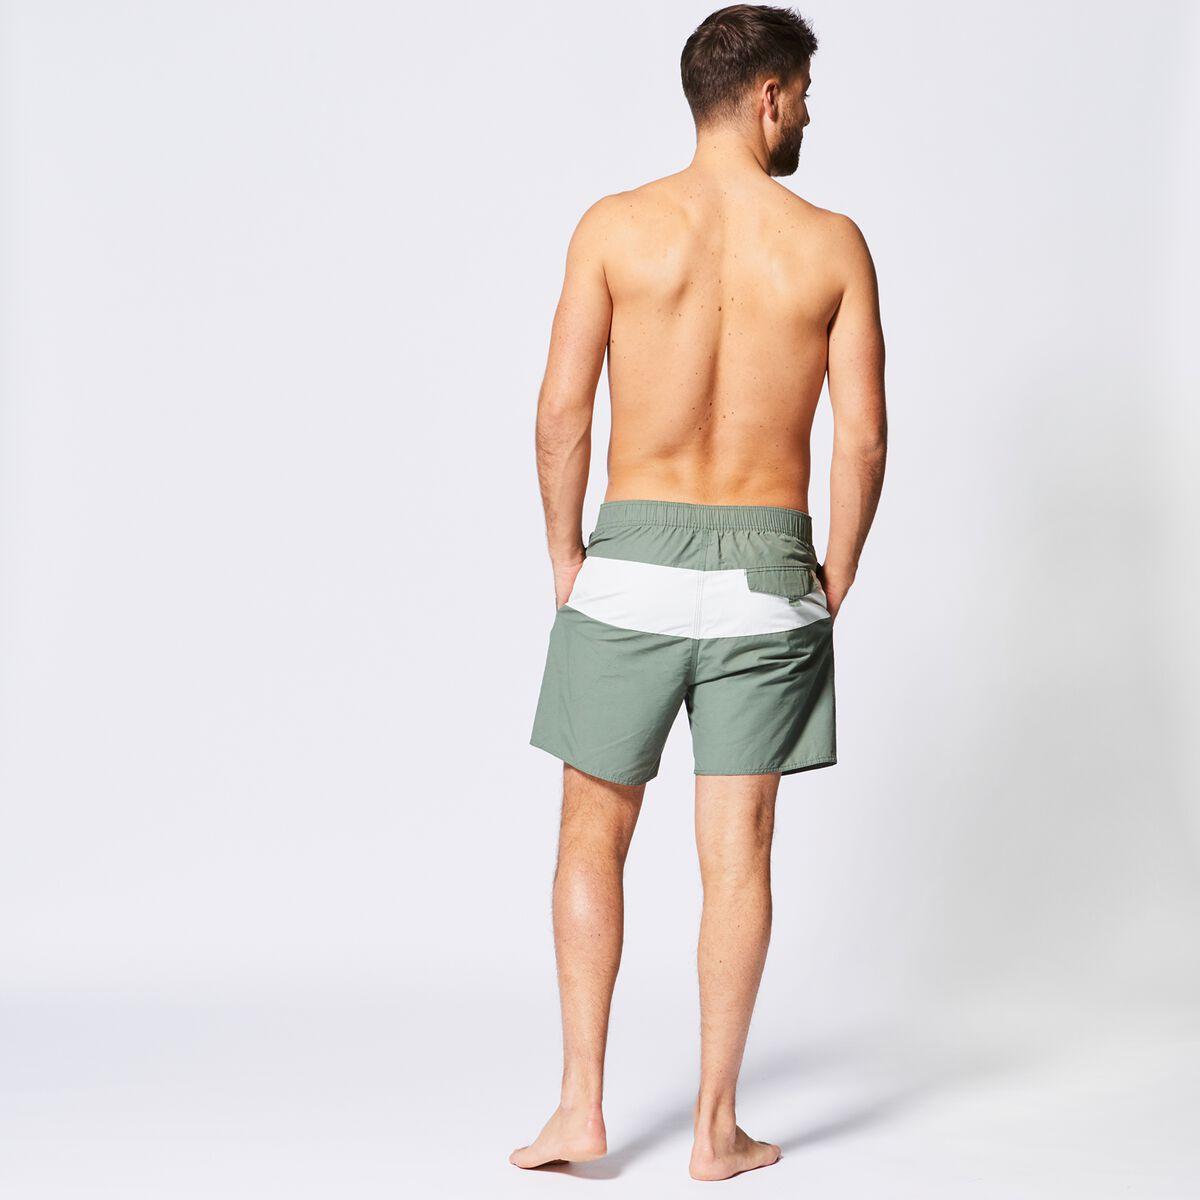 Swimming trunks Arlington Boardshort